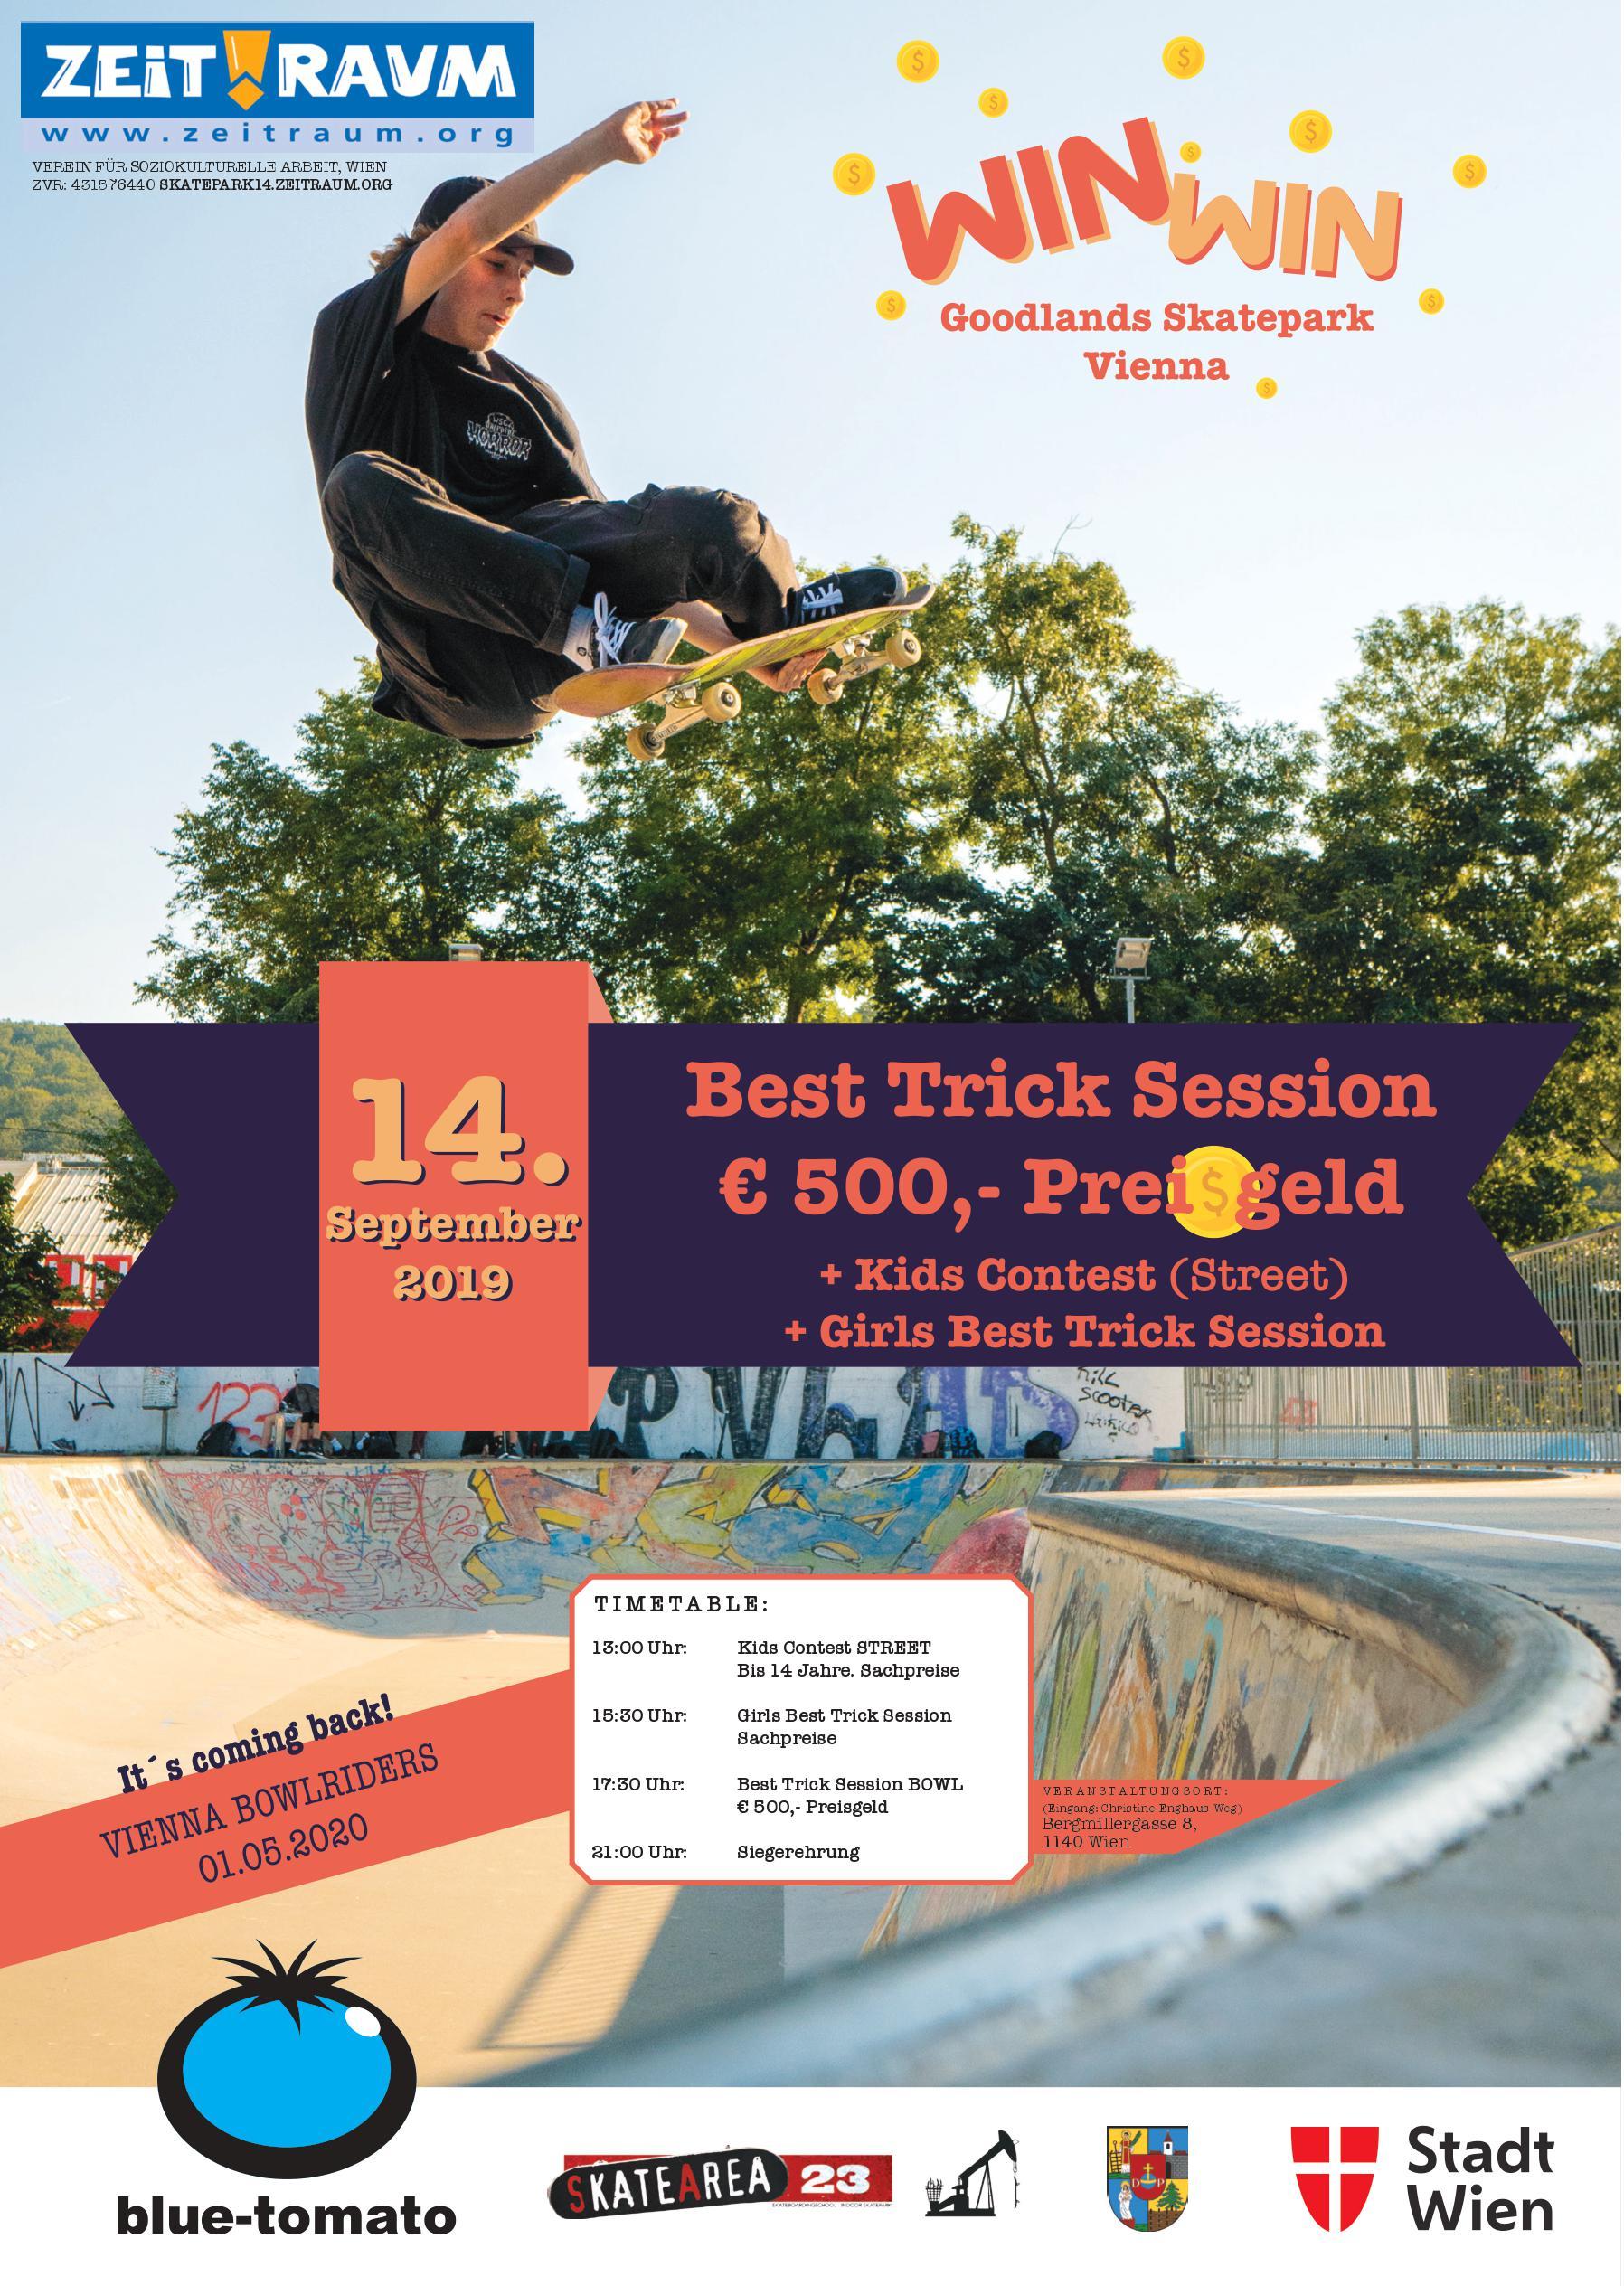 Best Trick Session - 14.09.19